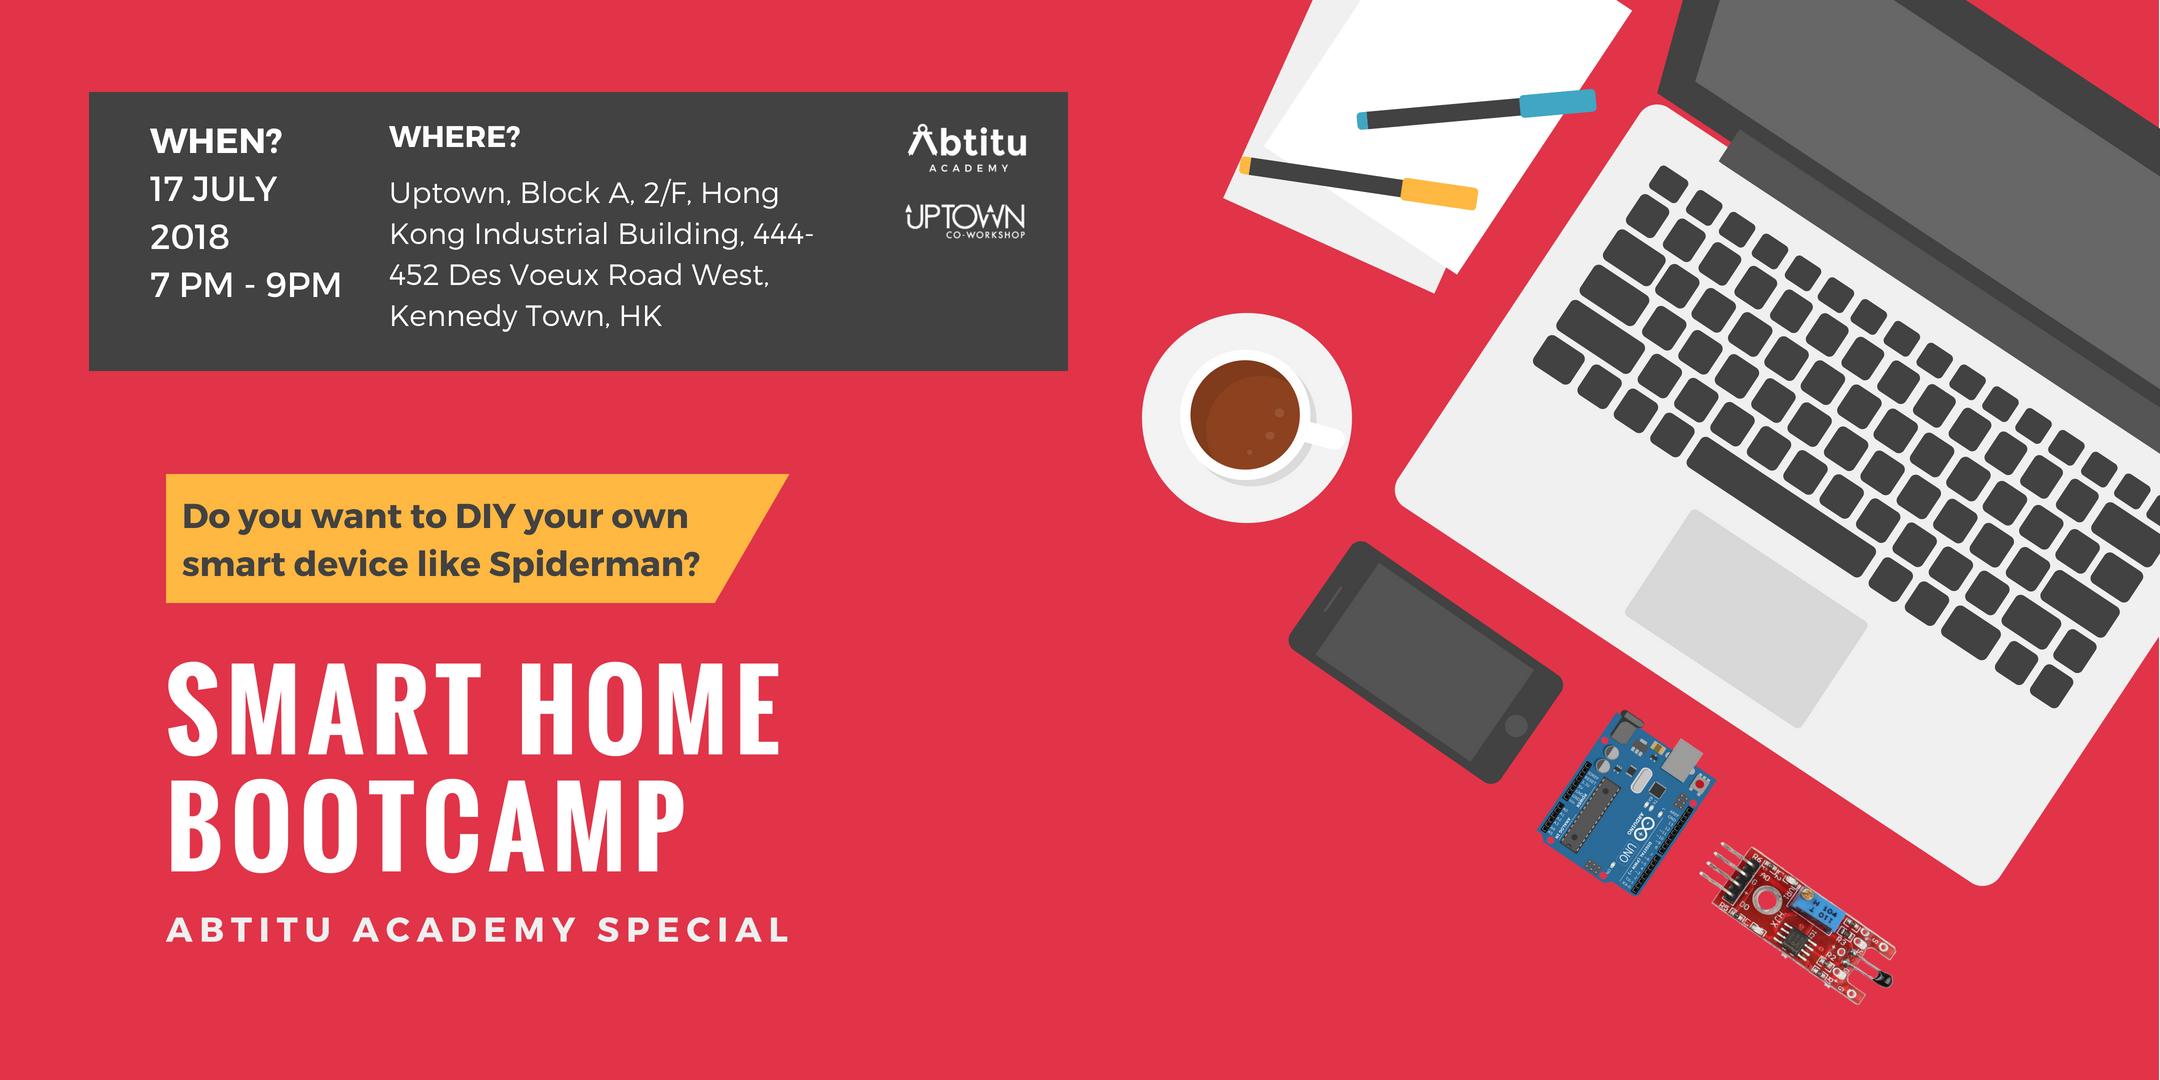 Smart Home Bootcamp: 人人砌APP,打造智能家居新領域!